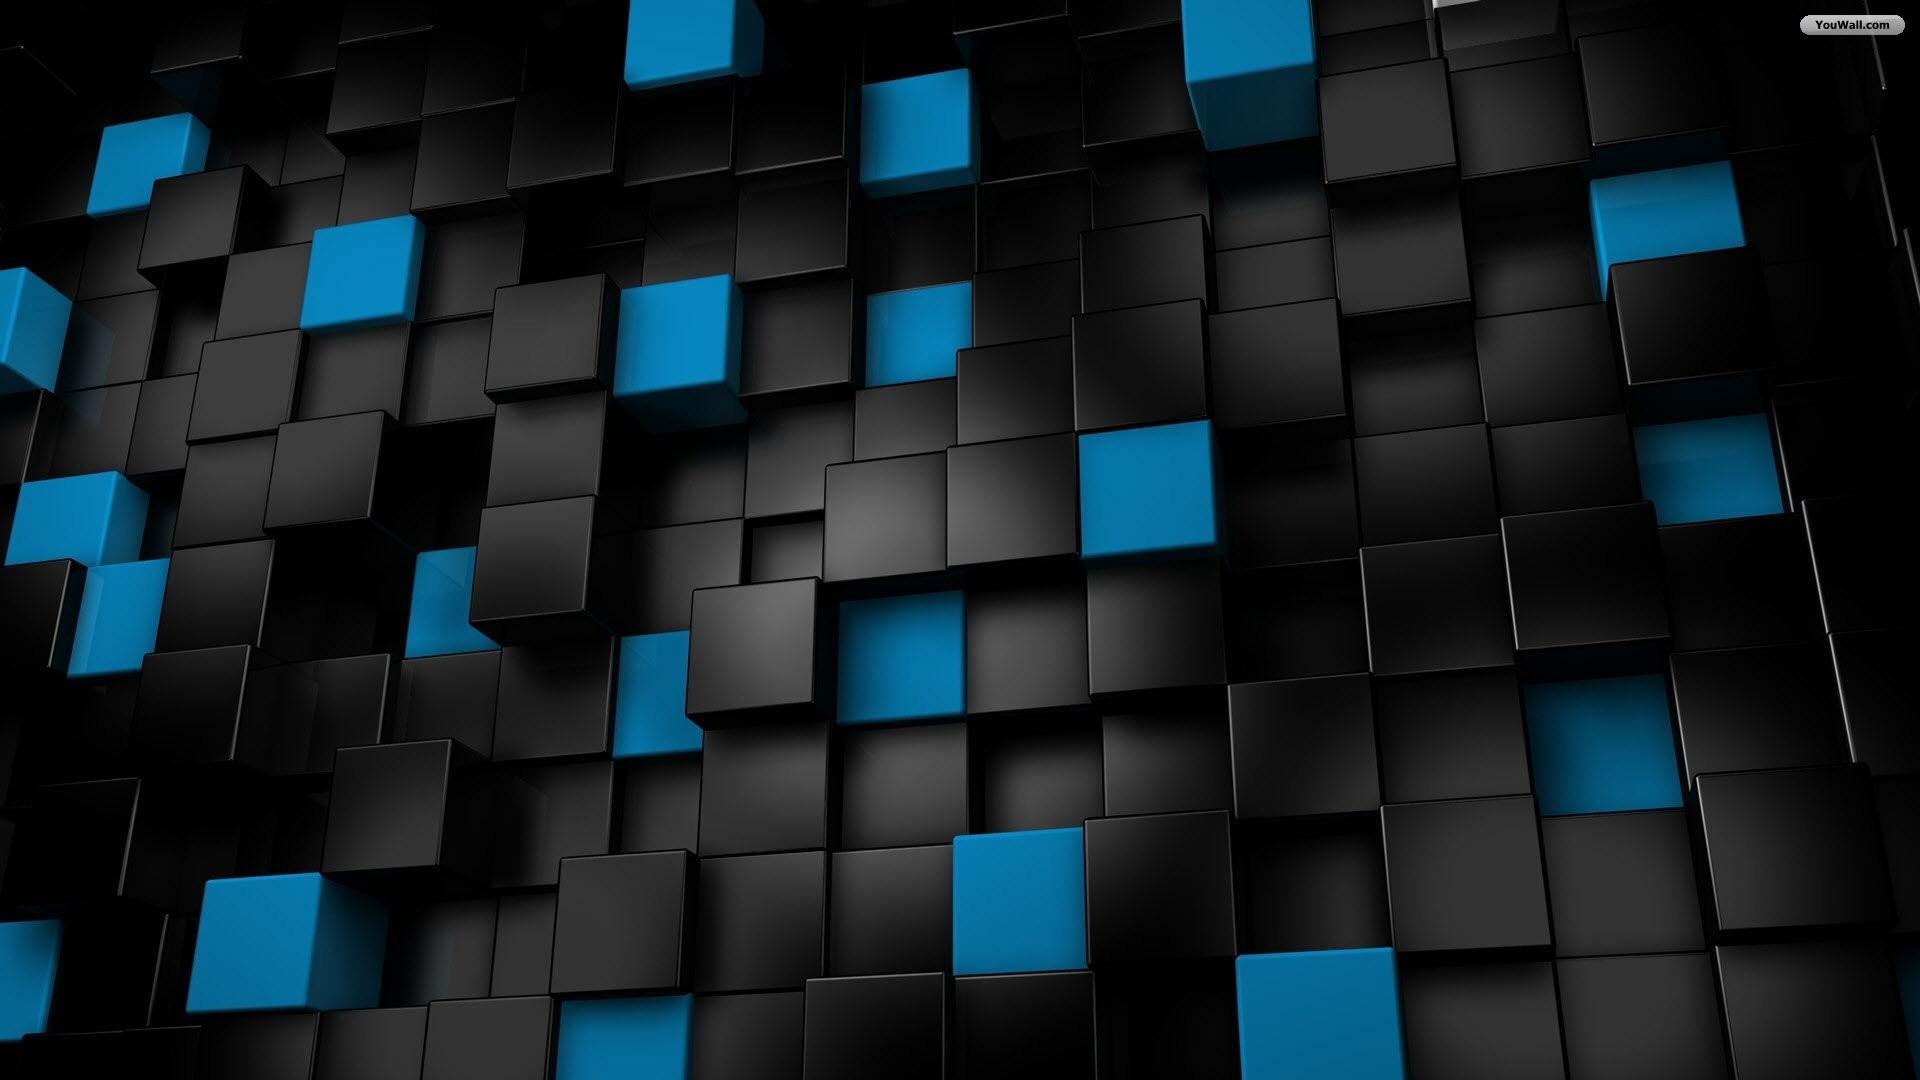 blue and black cubes wallpaper Wallpaper 3